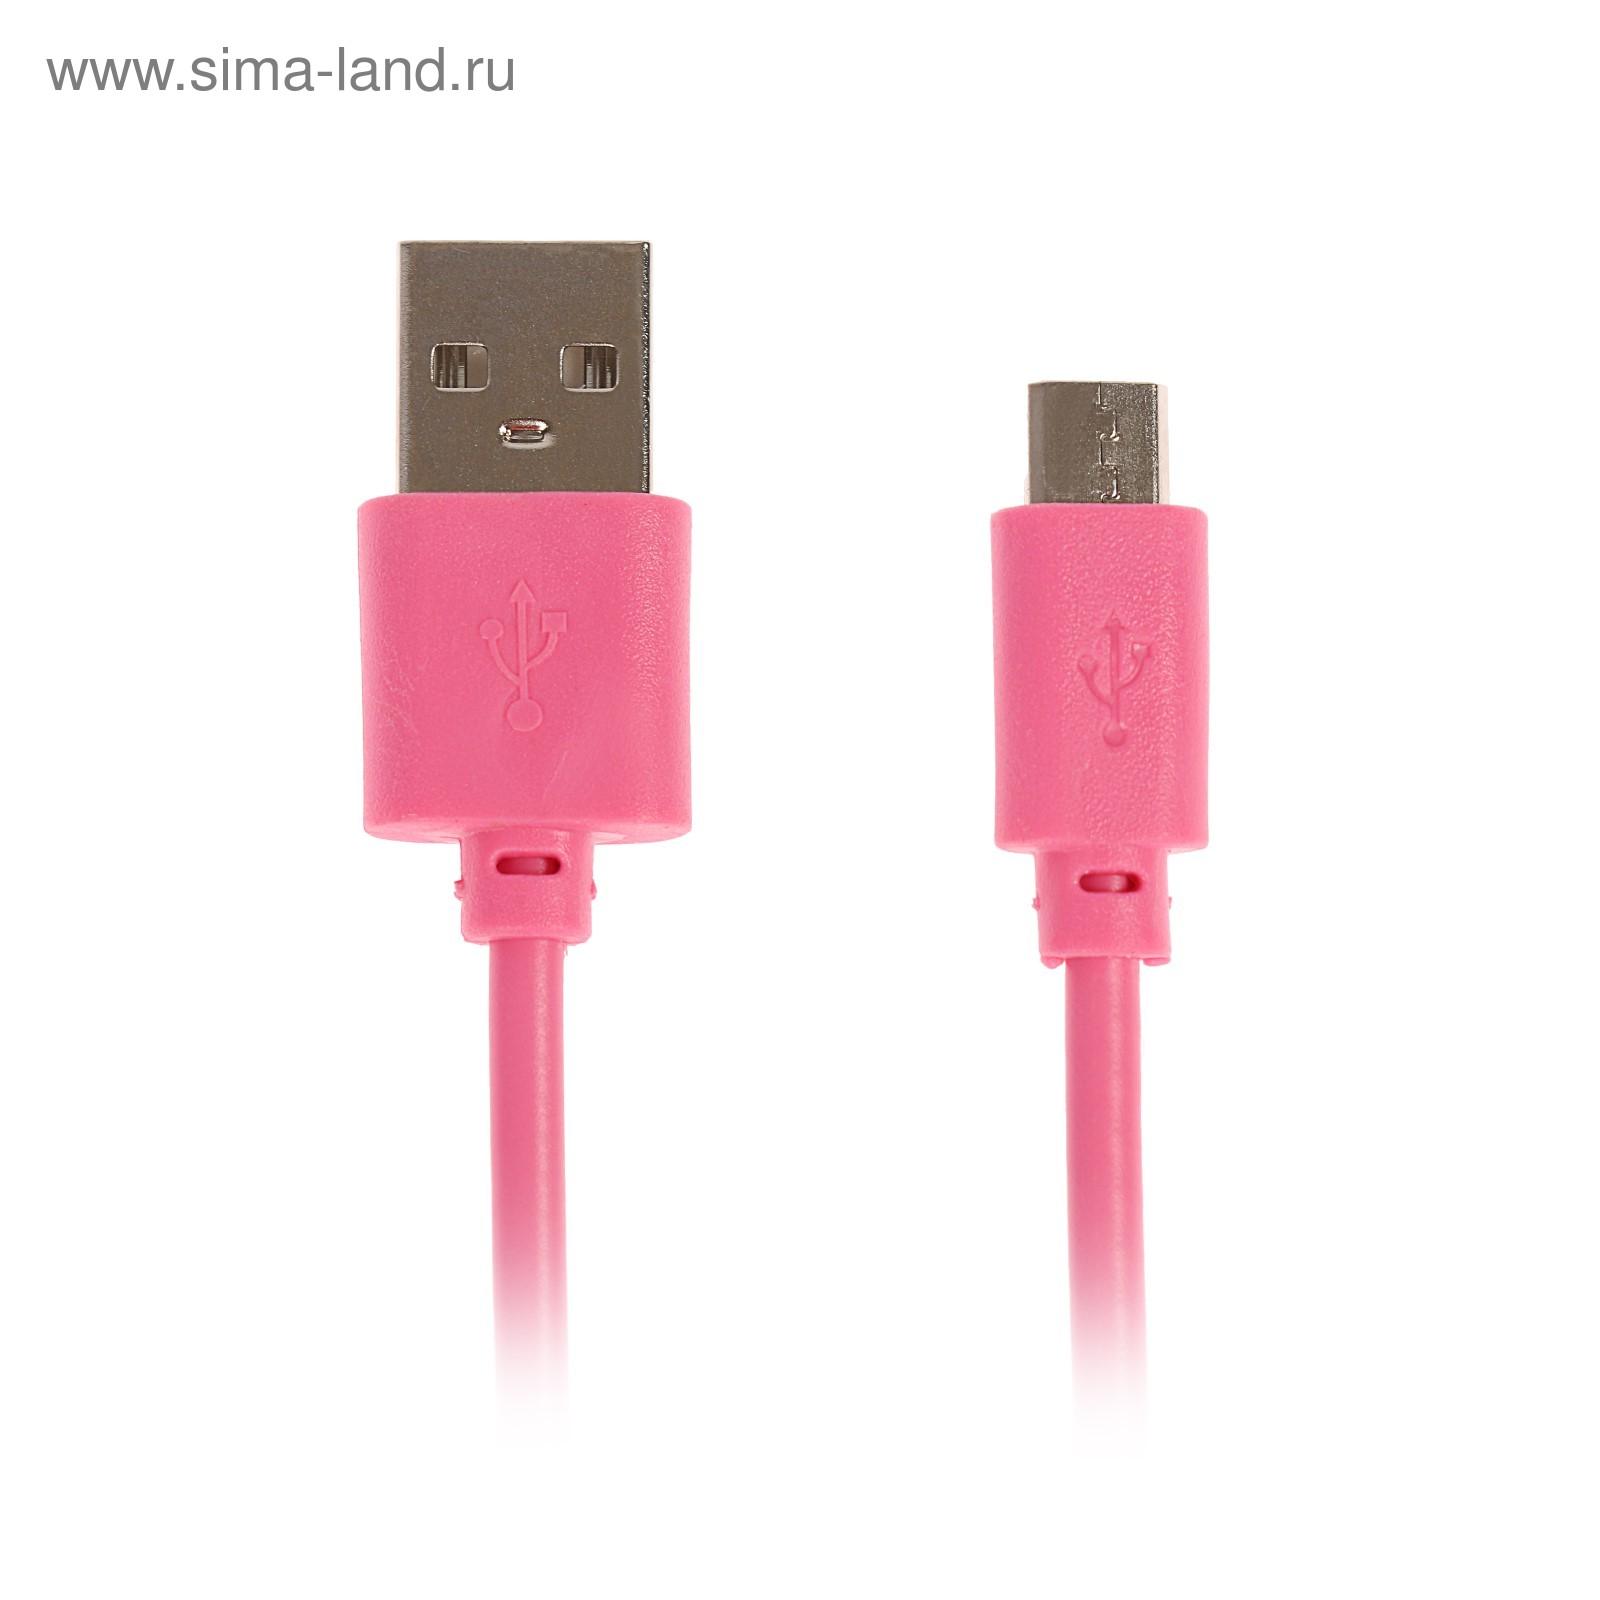 Кабель LuazON, micro USB - USB, 1 А, 1 м, розовый